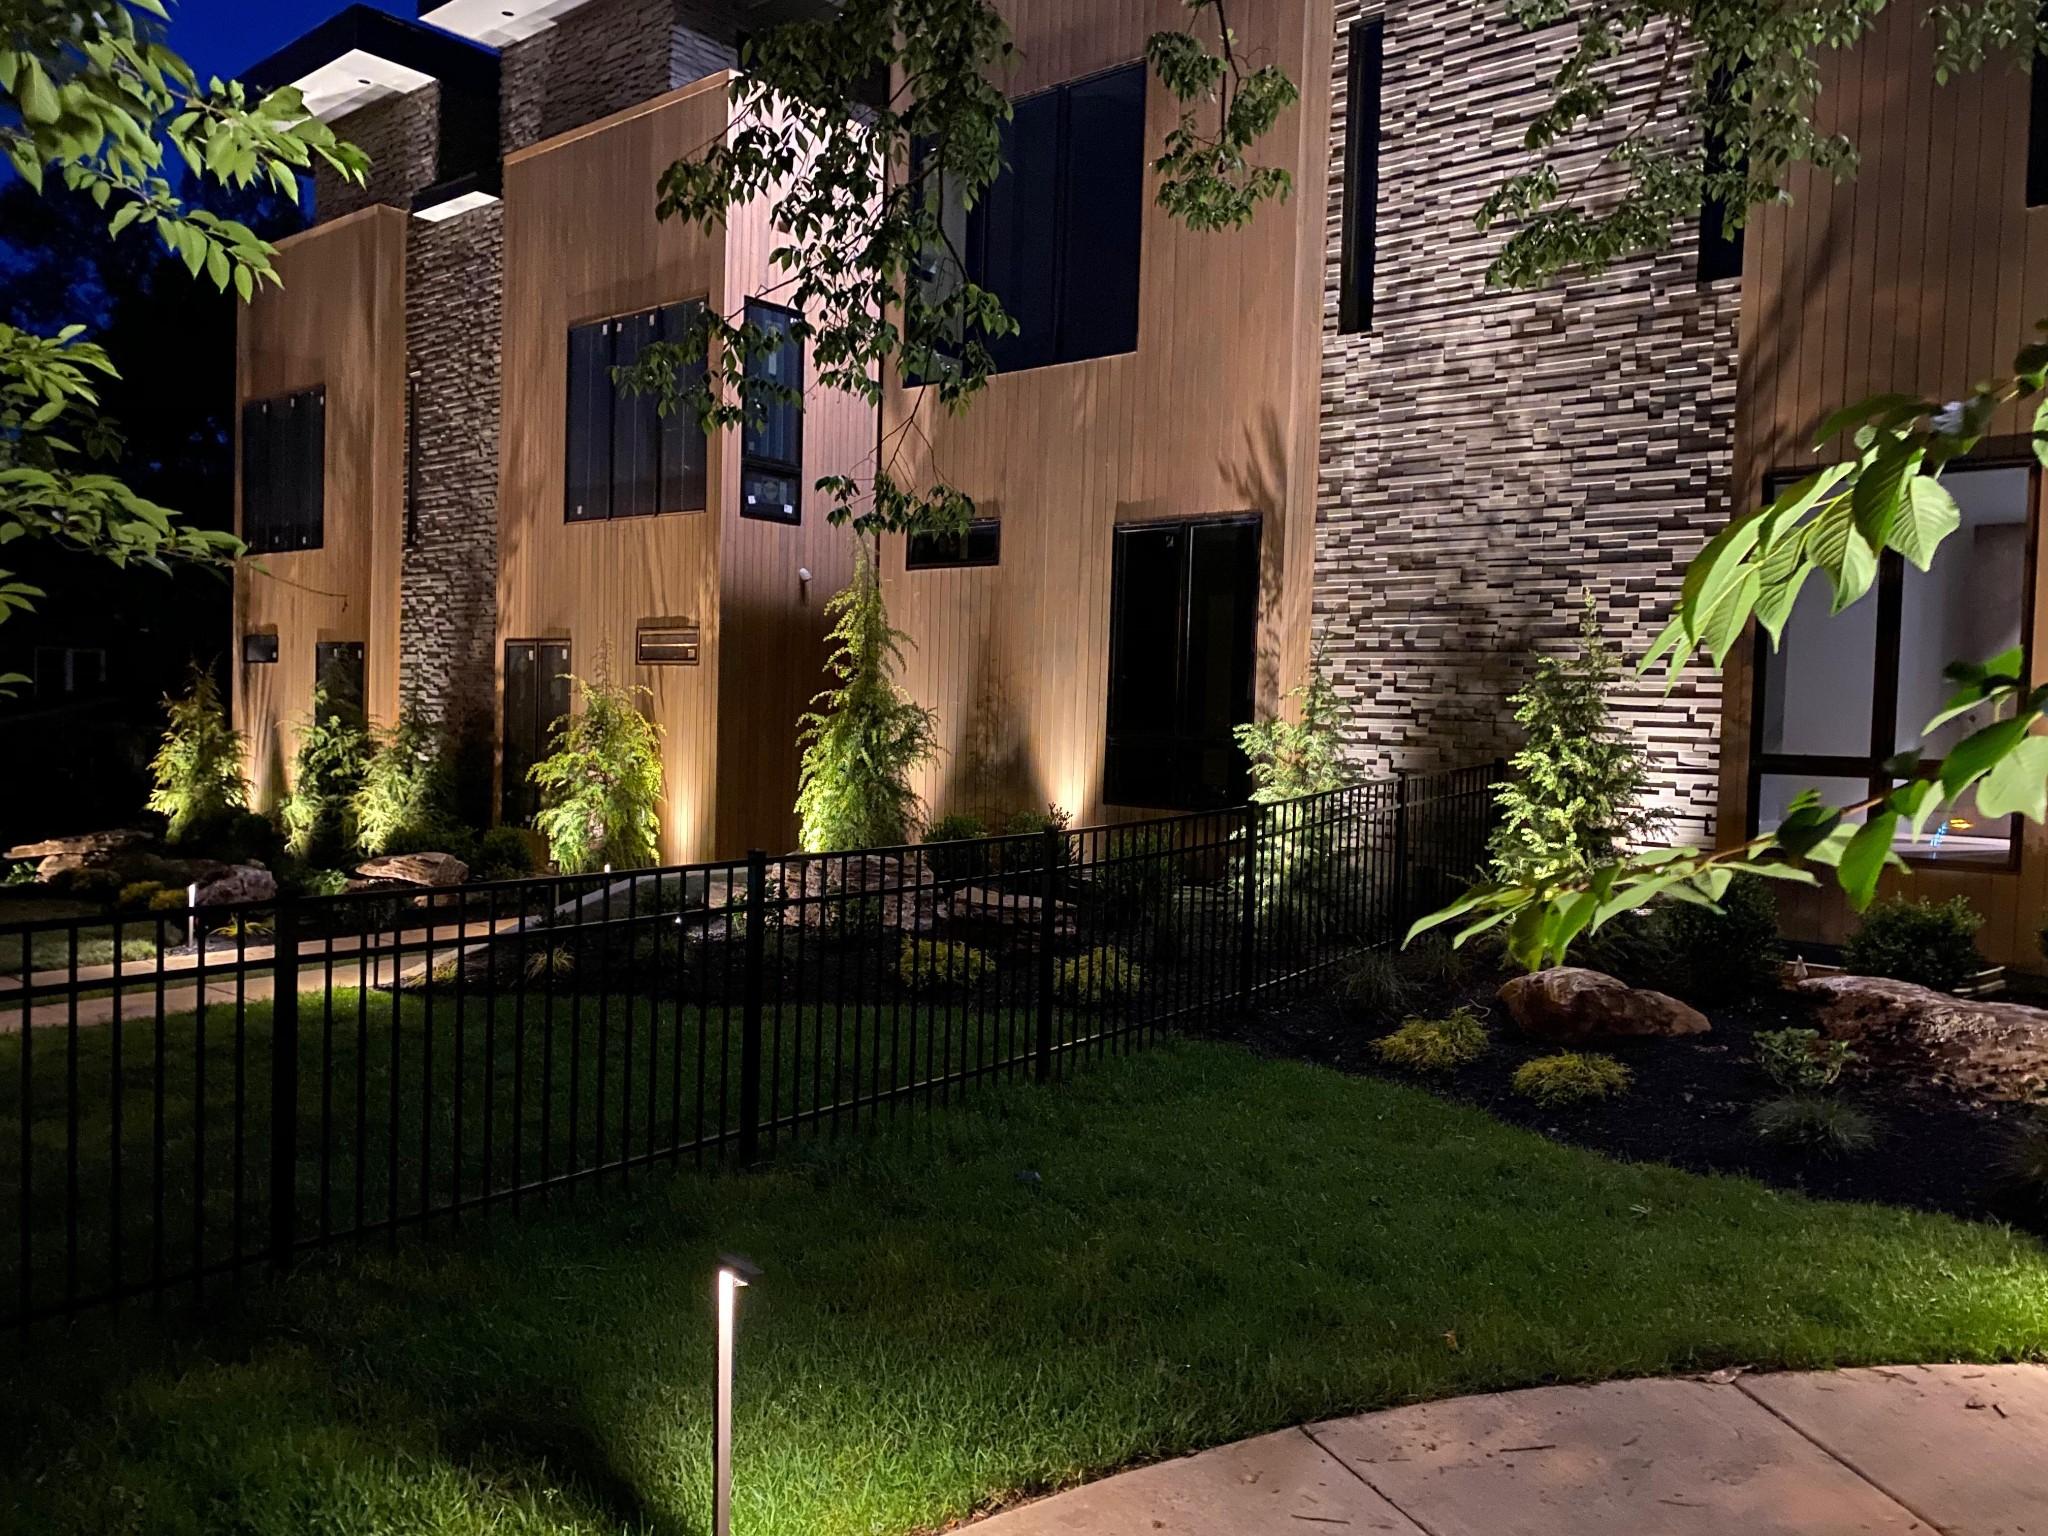 117B 46th Ave, N, Nashville, TN 37209 - Nashville, TN real estate listing